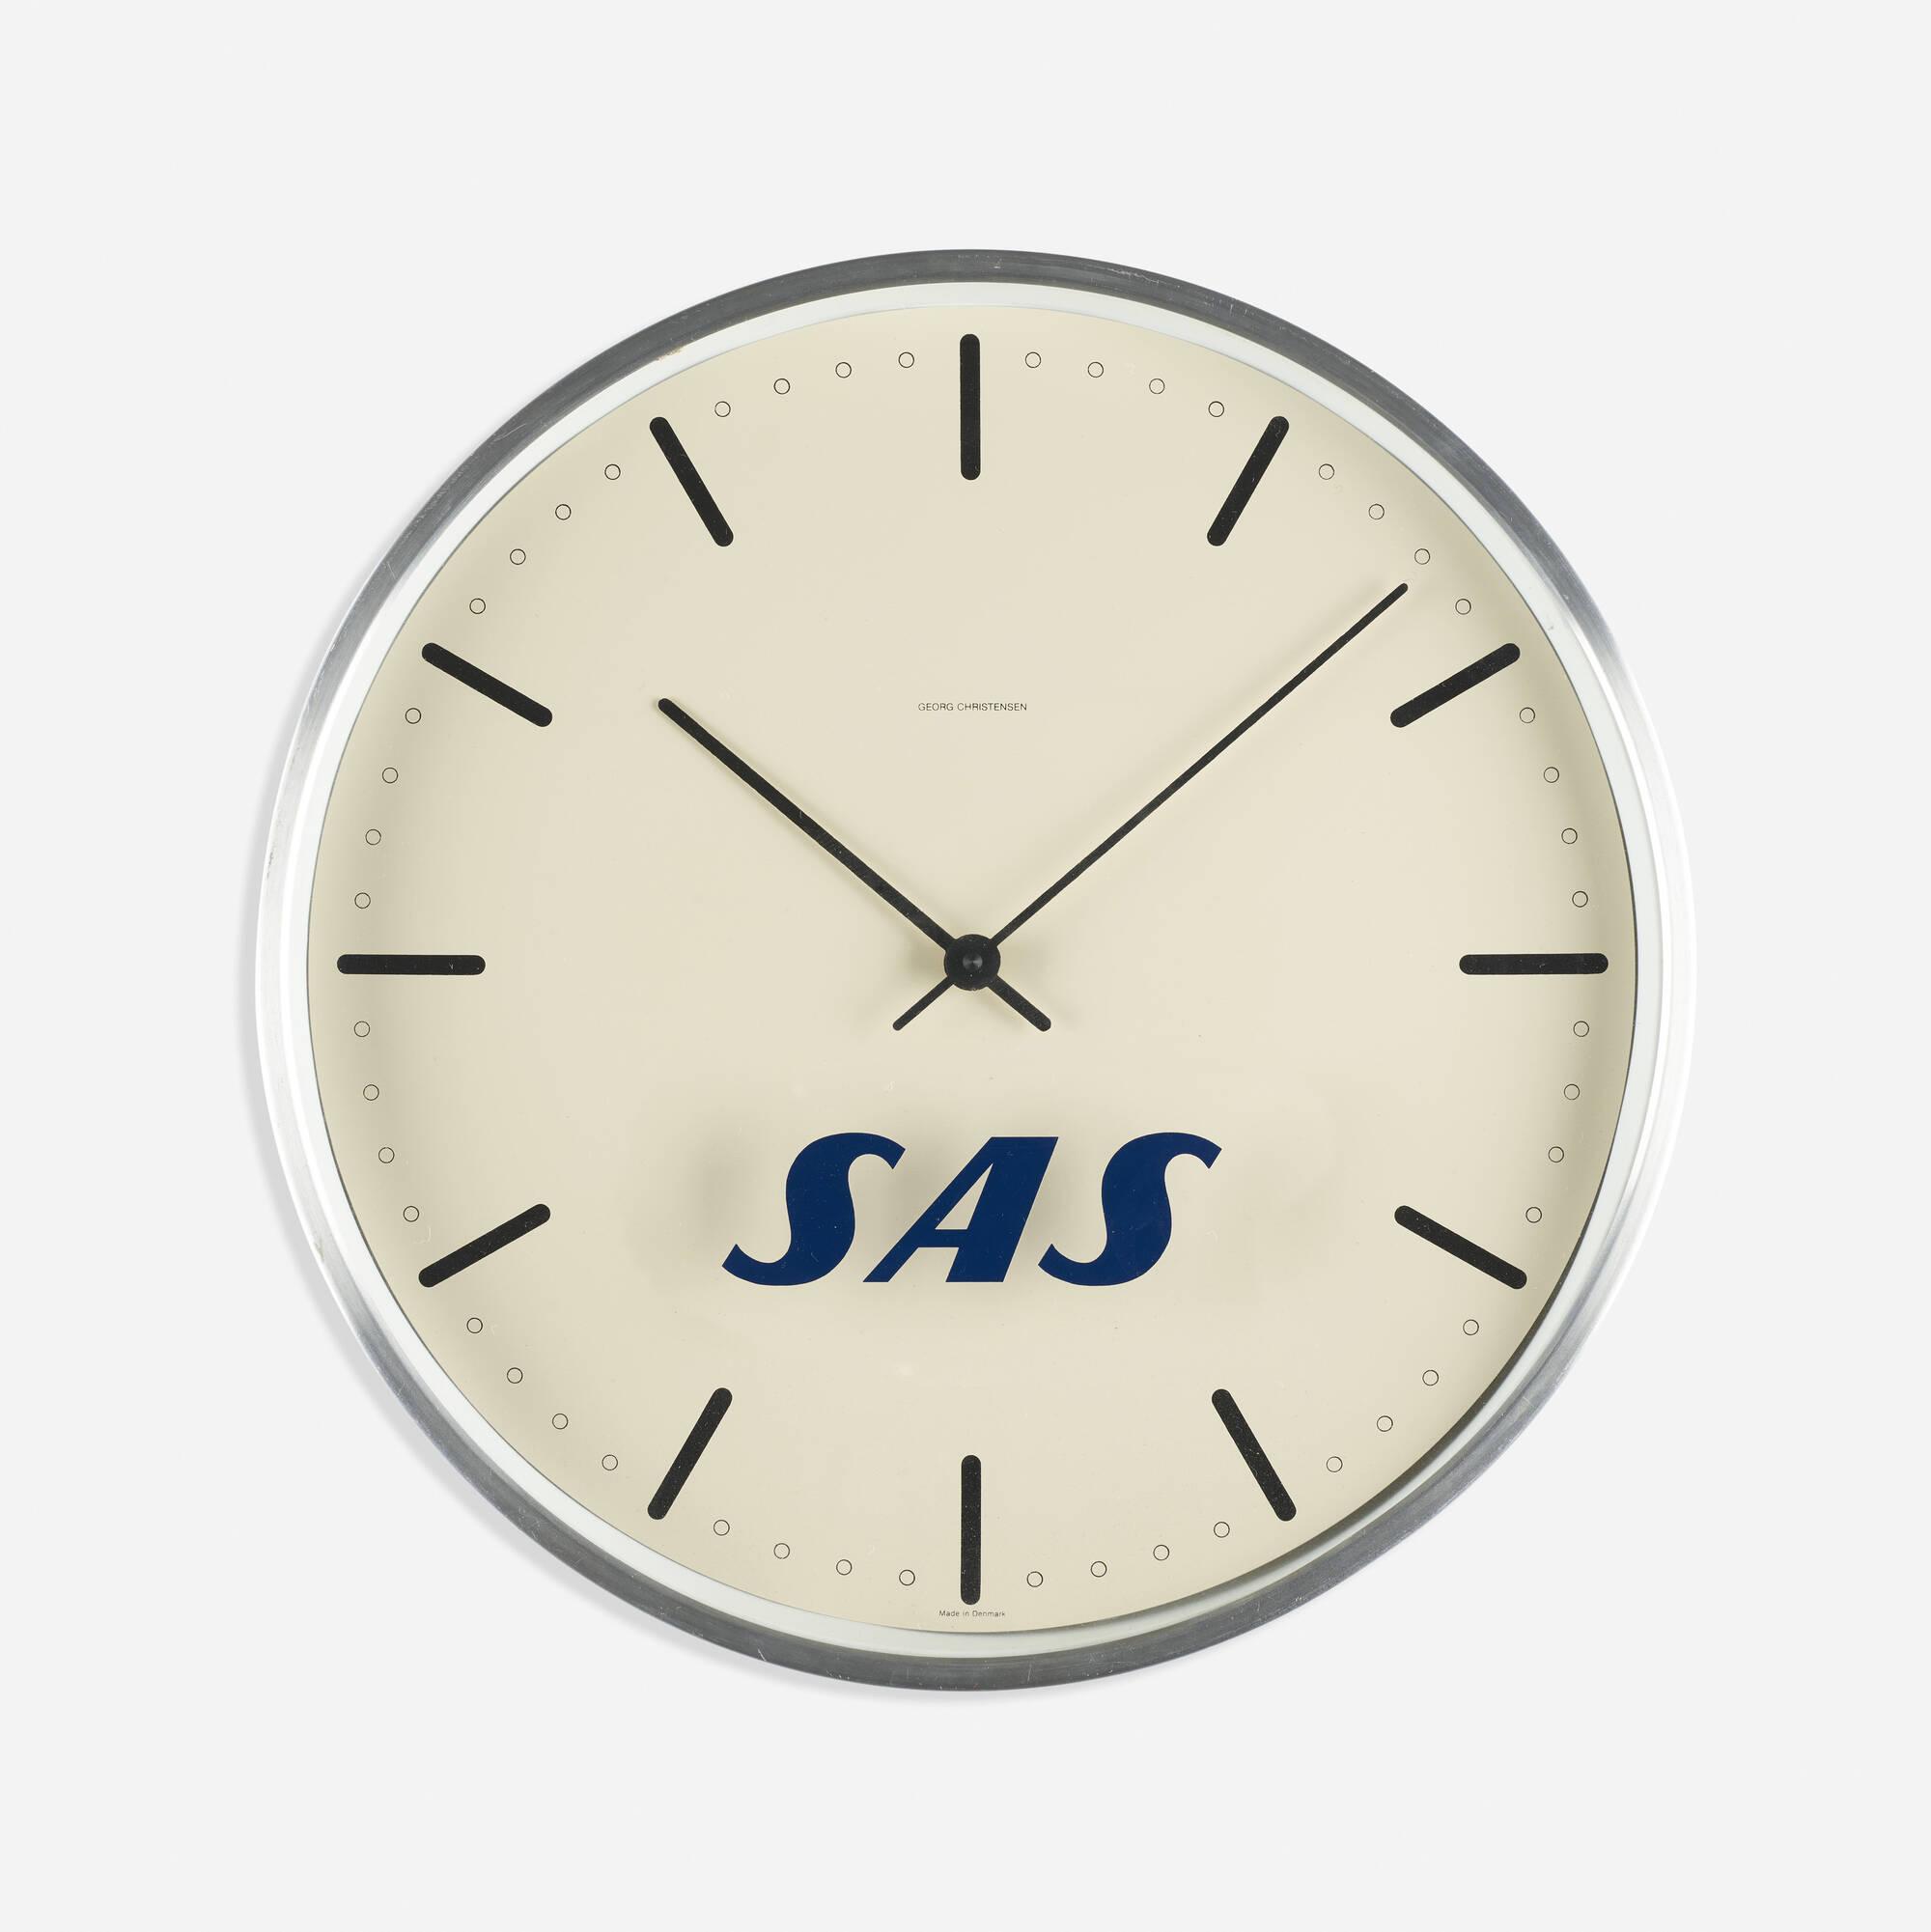 113: Arne Jacobsen / City Hall wall clock for SAS (1 of 1)